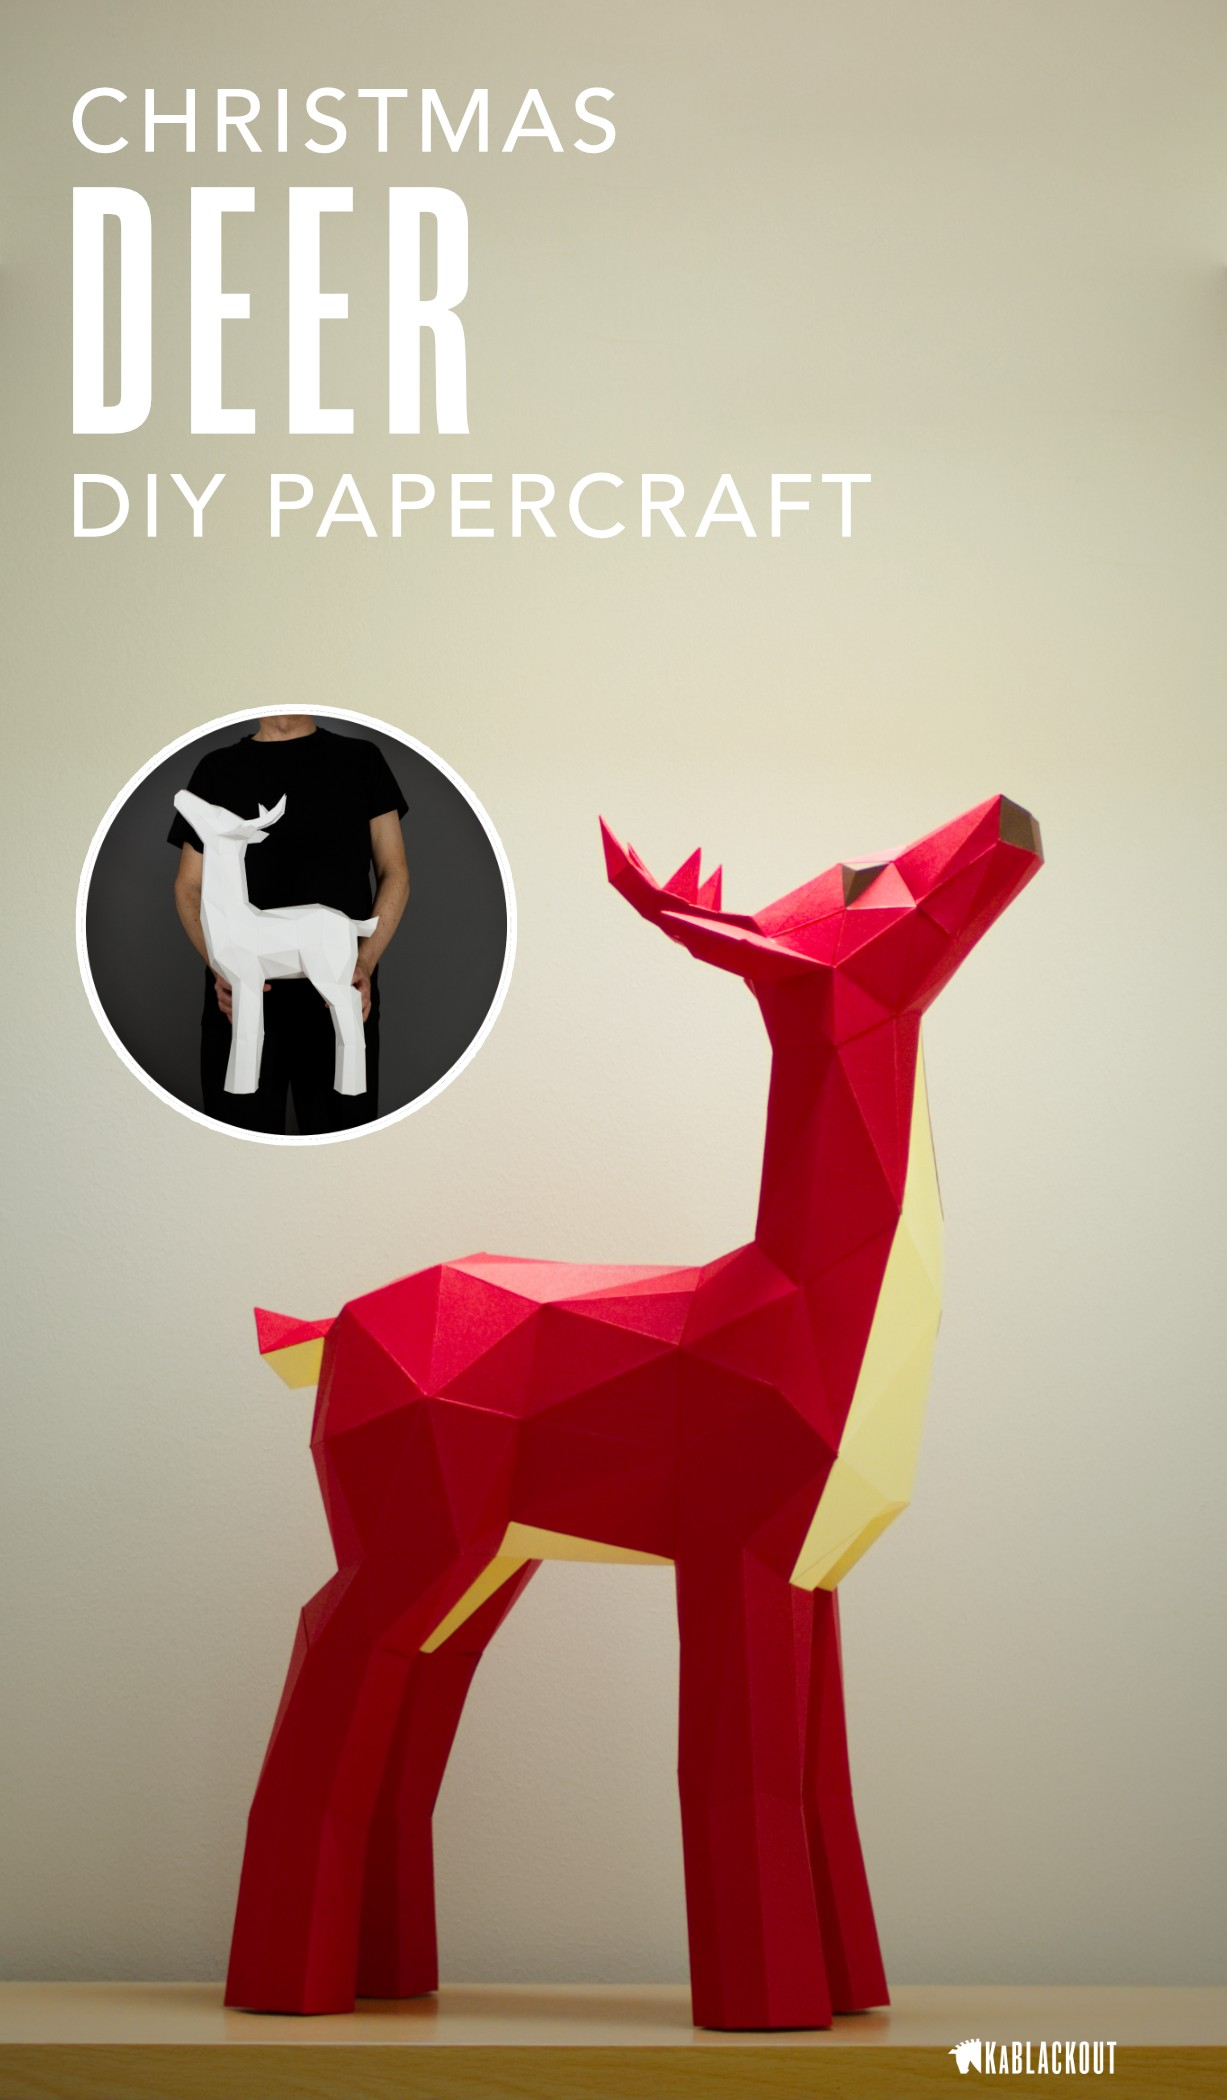 Christmas Papercraft Deer Papercraft Papercraft Deer Diy Deer Low Poly Deer Deer